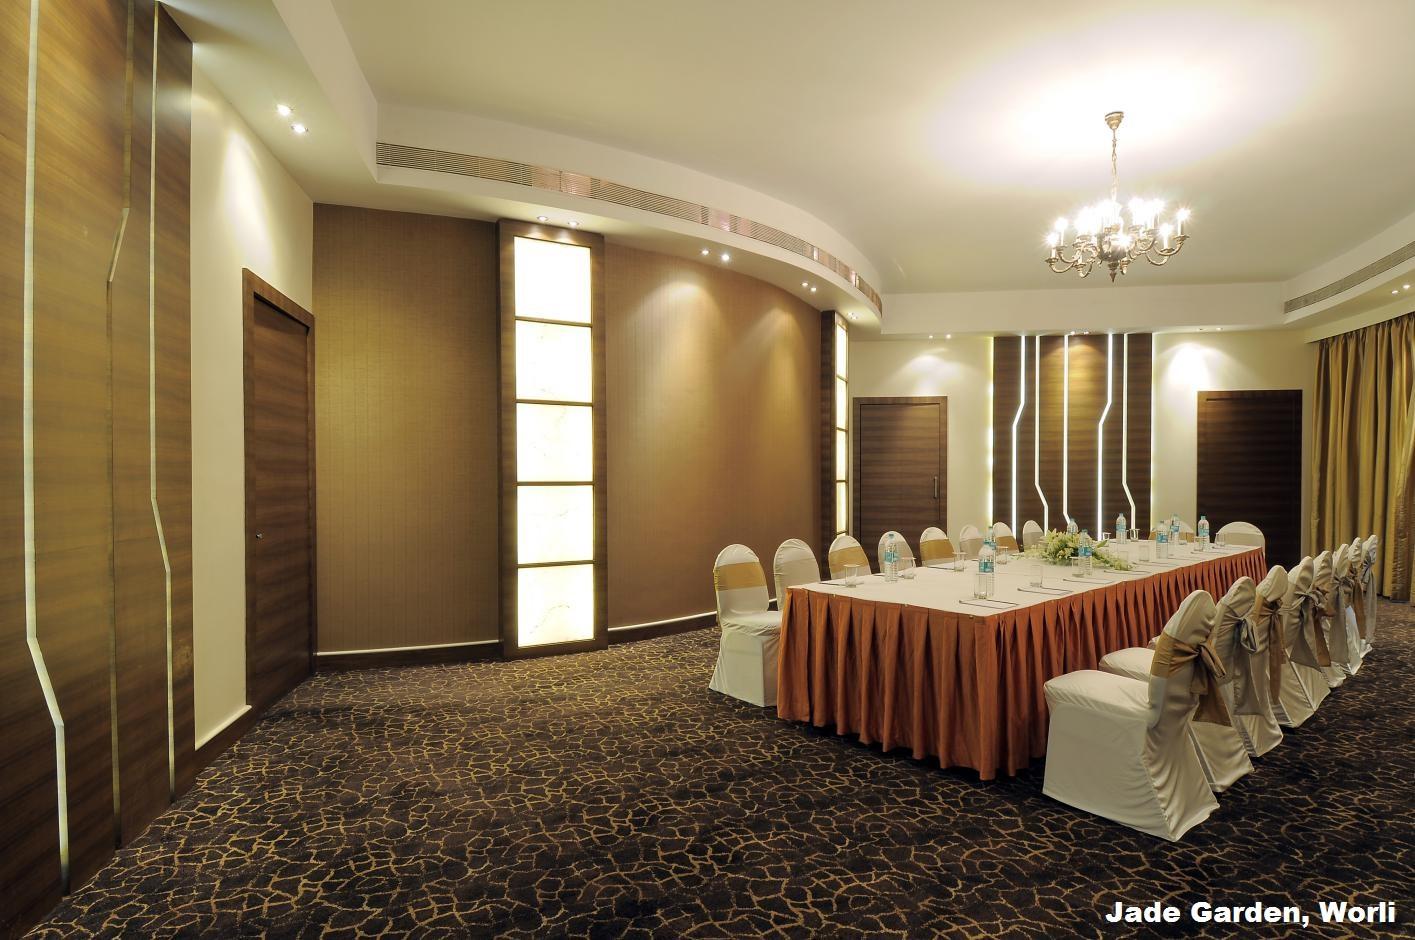 Jade Garden, Worli - Private Dinning Room